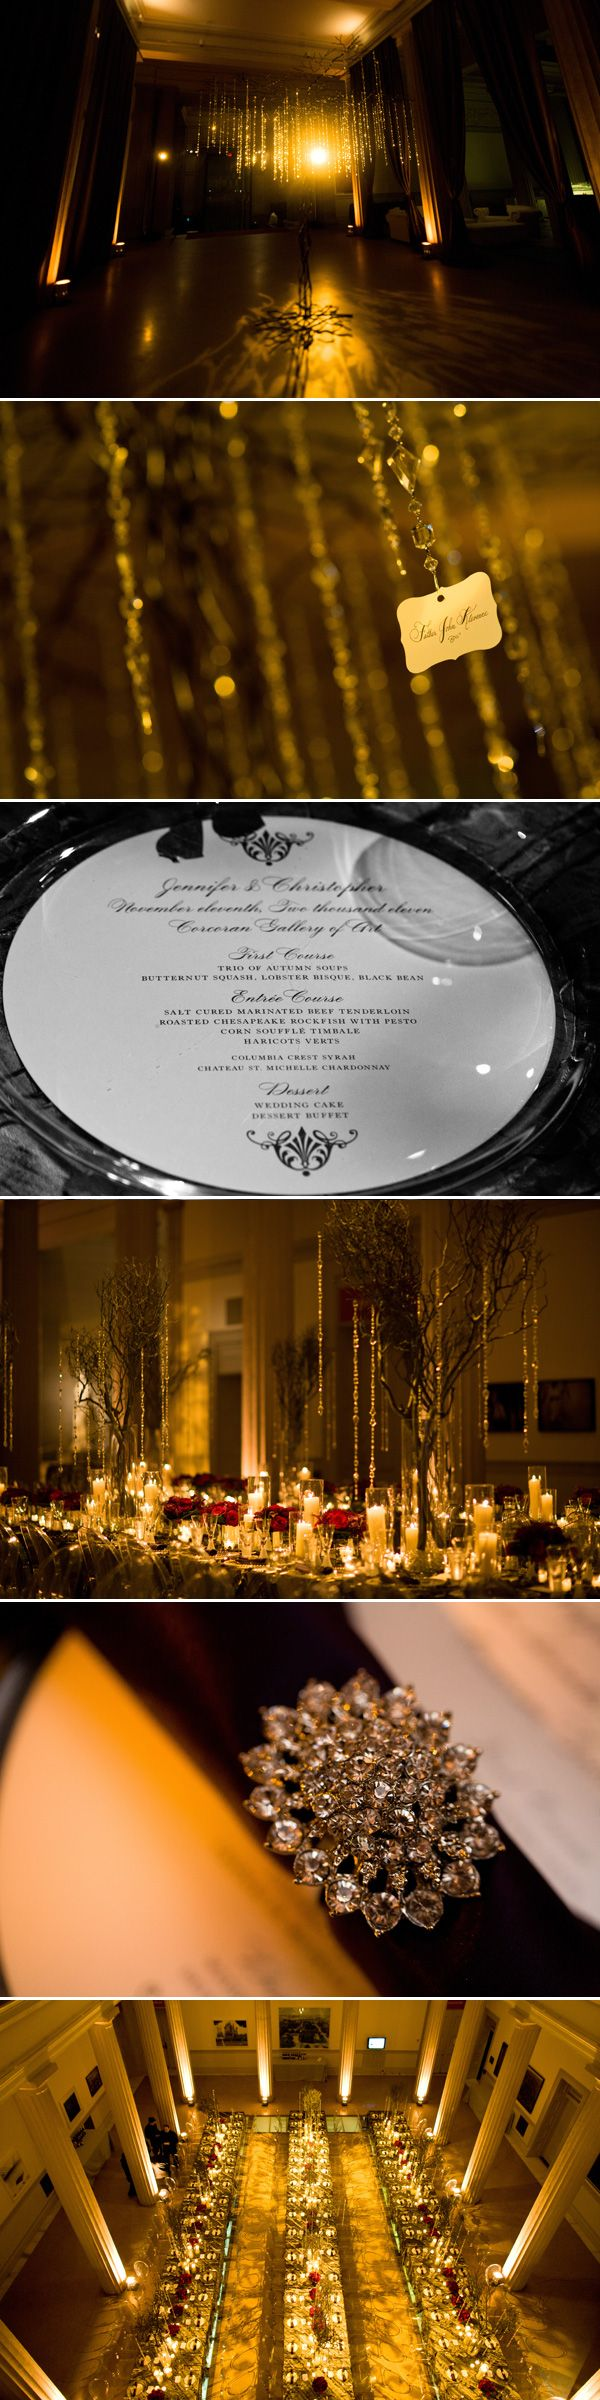 Corcoran Gallery Wedding